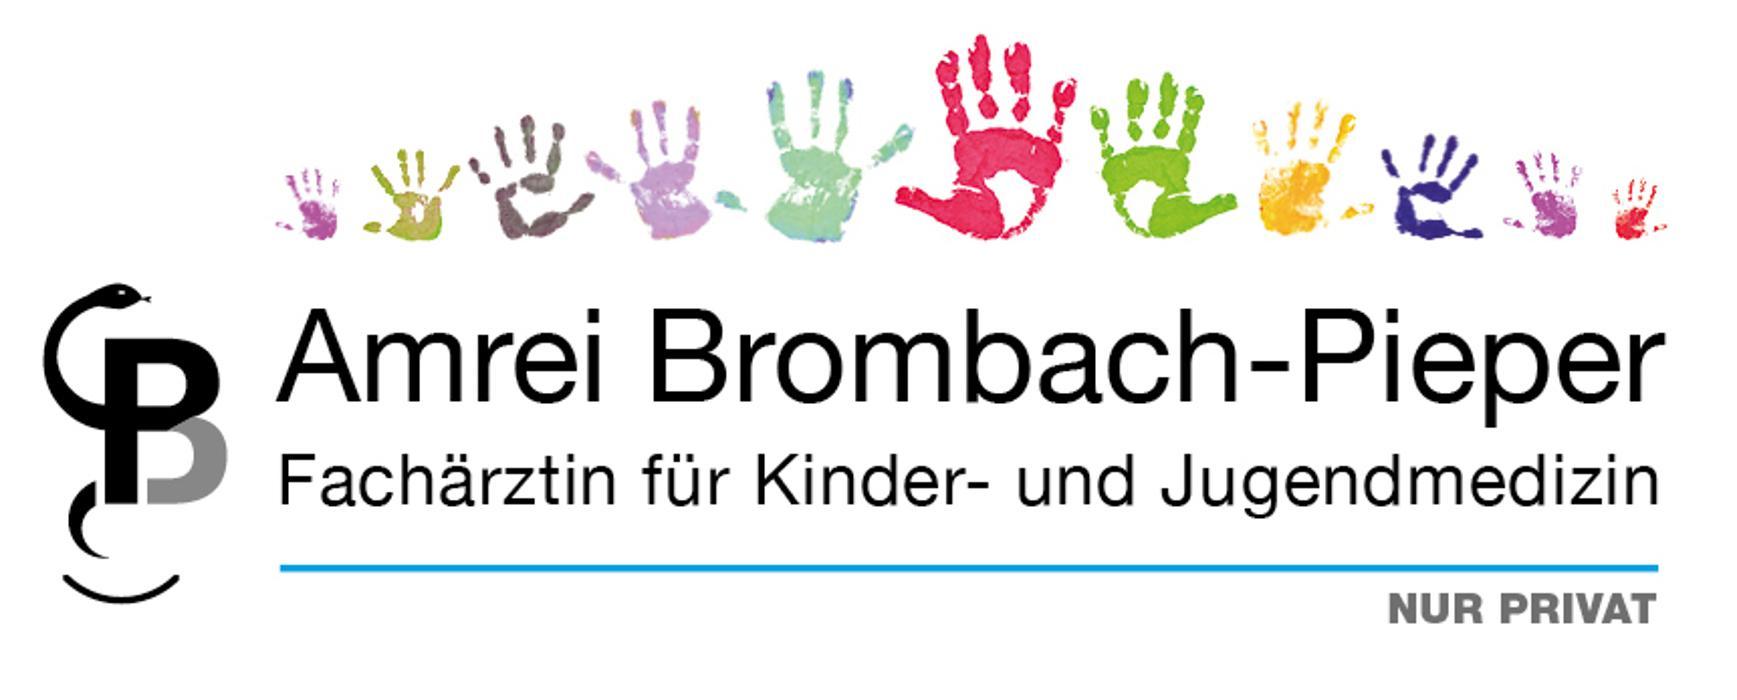 Bild zu Kinderarztpraxis Brombach-Pieper in Neunkirchen Seelscheid